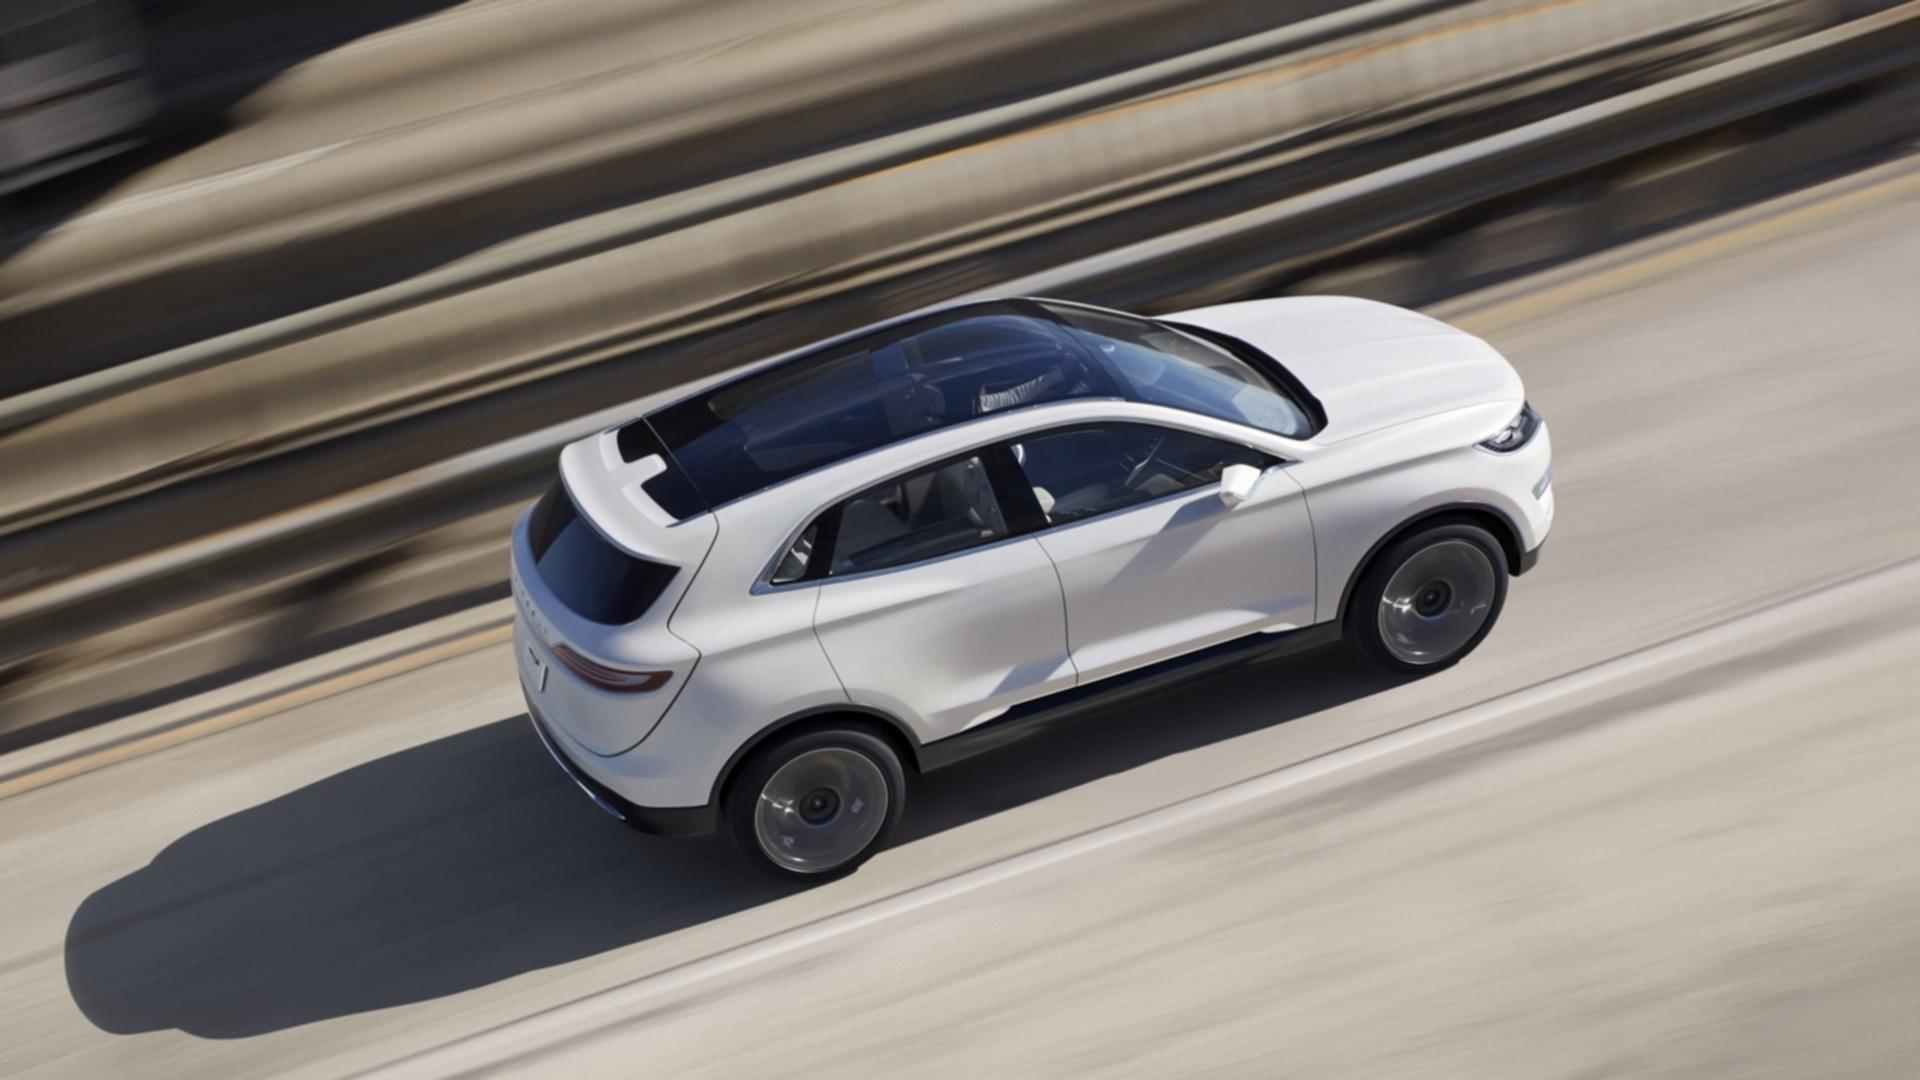 Wallpaper Lincoln Aviator Suv Cars Electric Car 4k Cars 2019